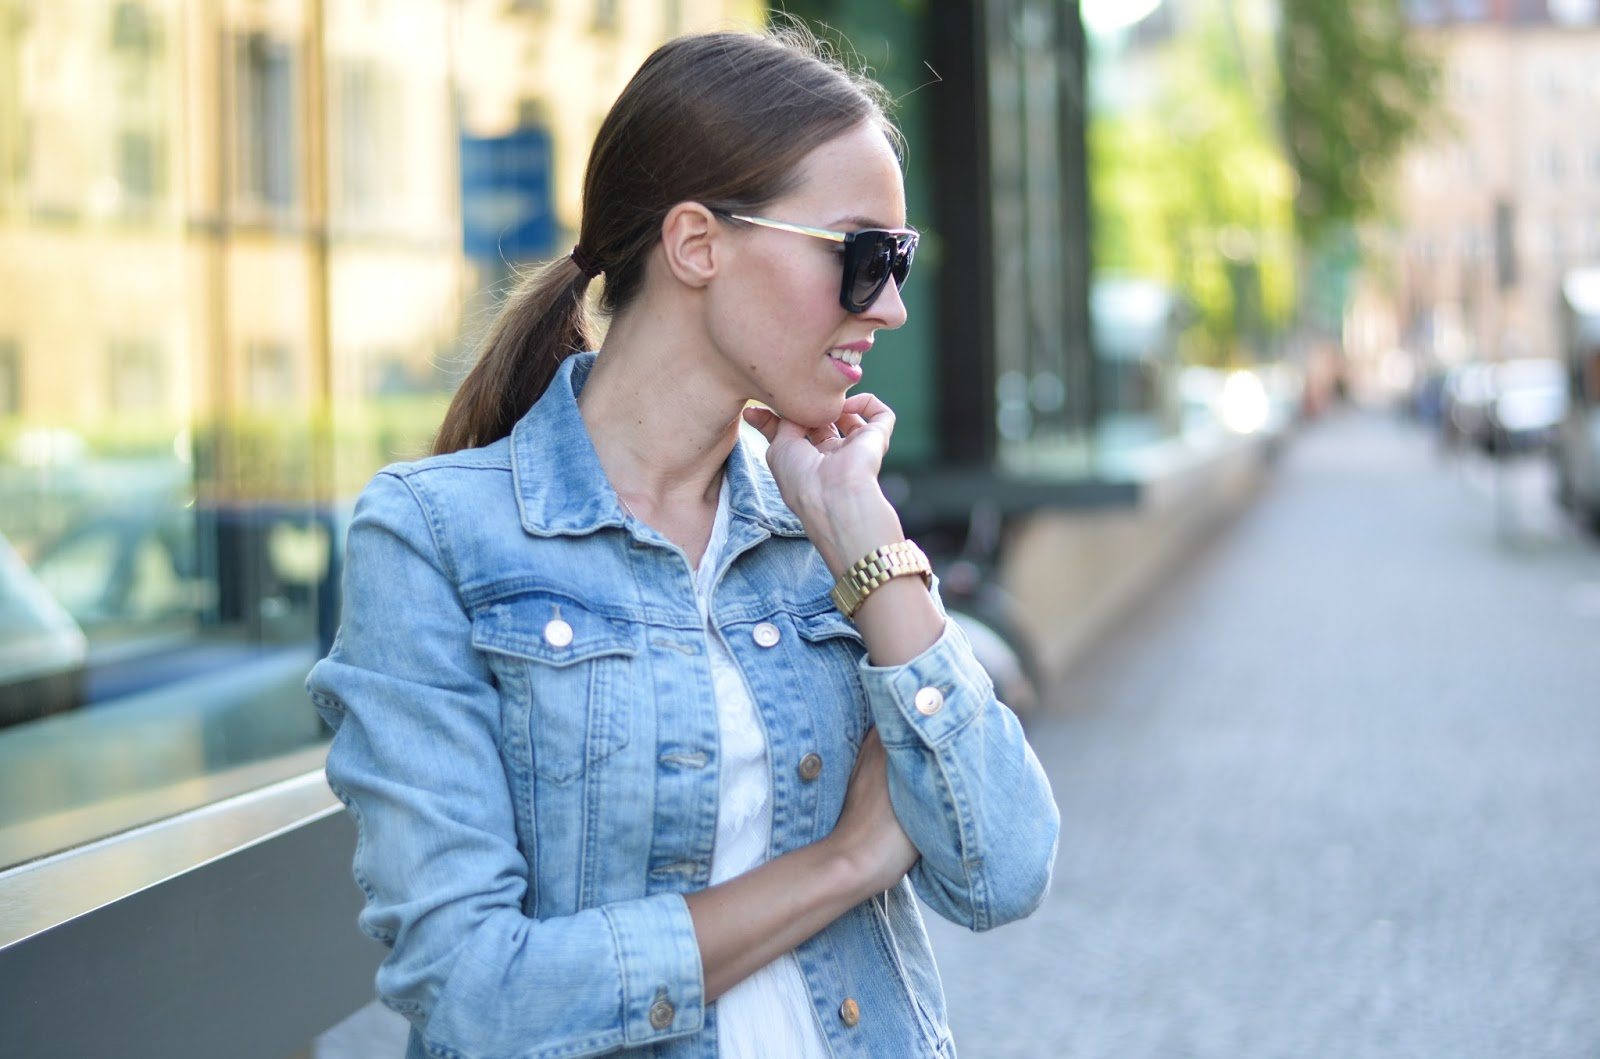 kristjaana mere prada sunglasses hm denim jacket street style